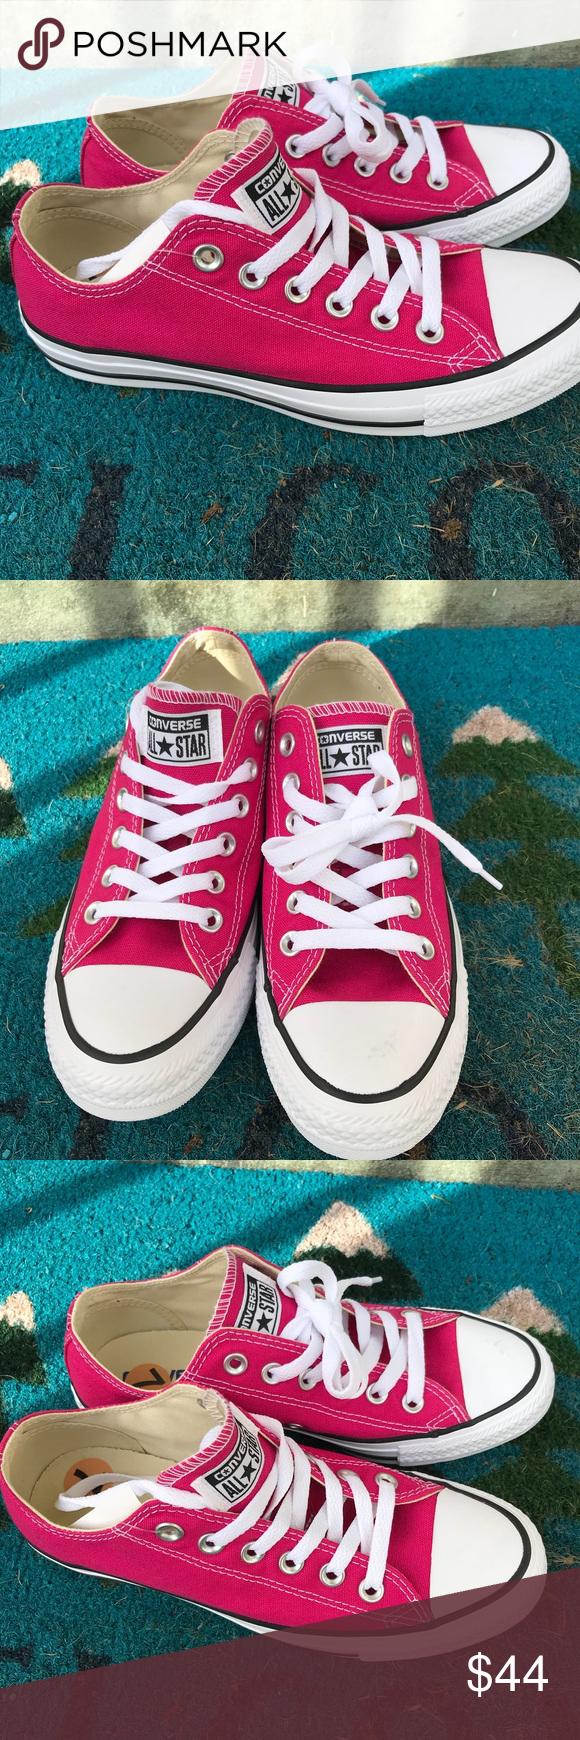 Dark pink Converse All Star low tops